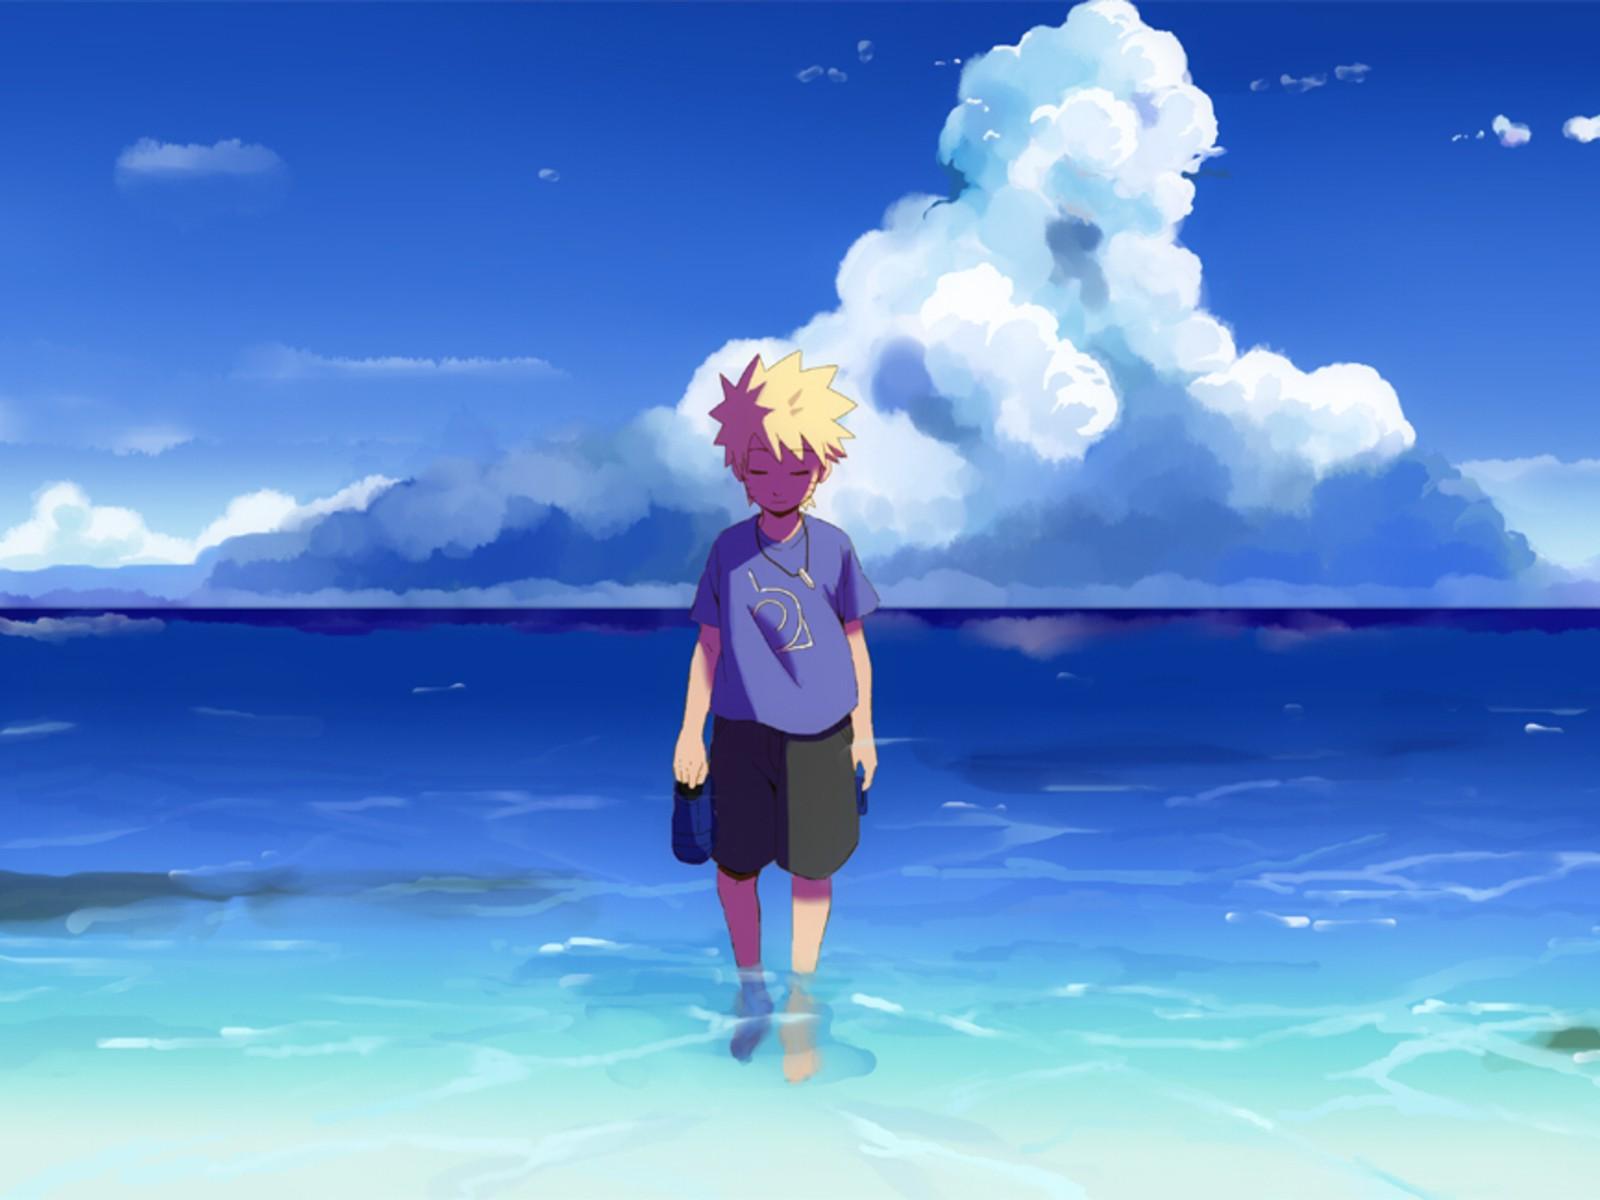 Sad Boy And Girl Full Hd Wallpaper Uzumaki Naruto Sea Anime Boys Wallpapers Hd Desktop